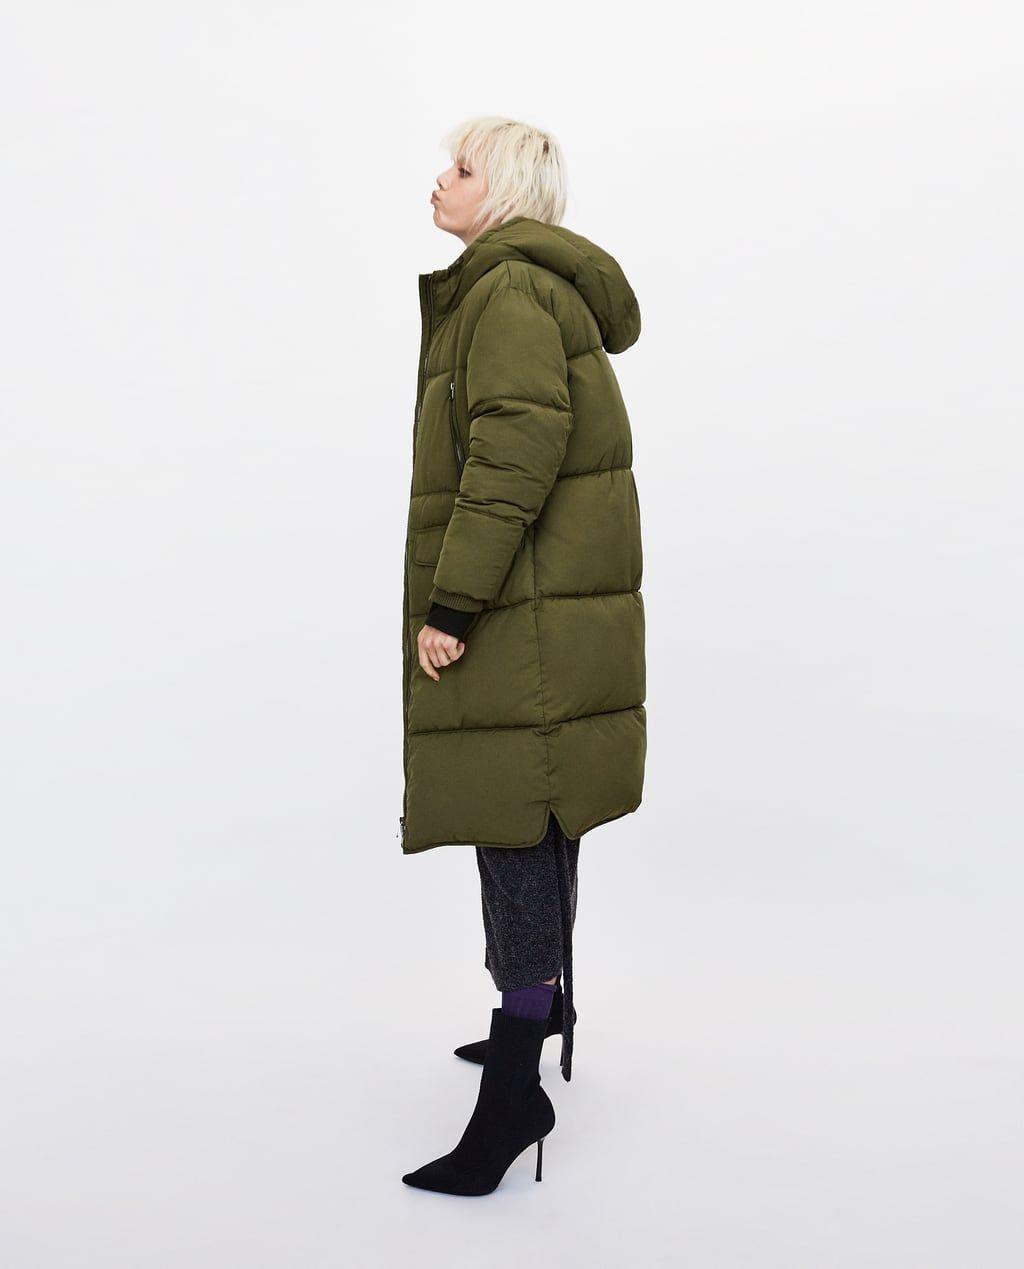 Image 4 Of Long Oversized Puffer Coat From Zara Oversized Puffer Oversized Puffer Coat Puffer Coat [ 1269 x 1024 Pixel ]